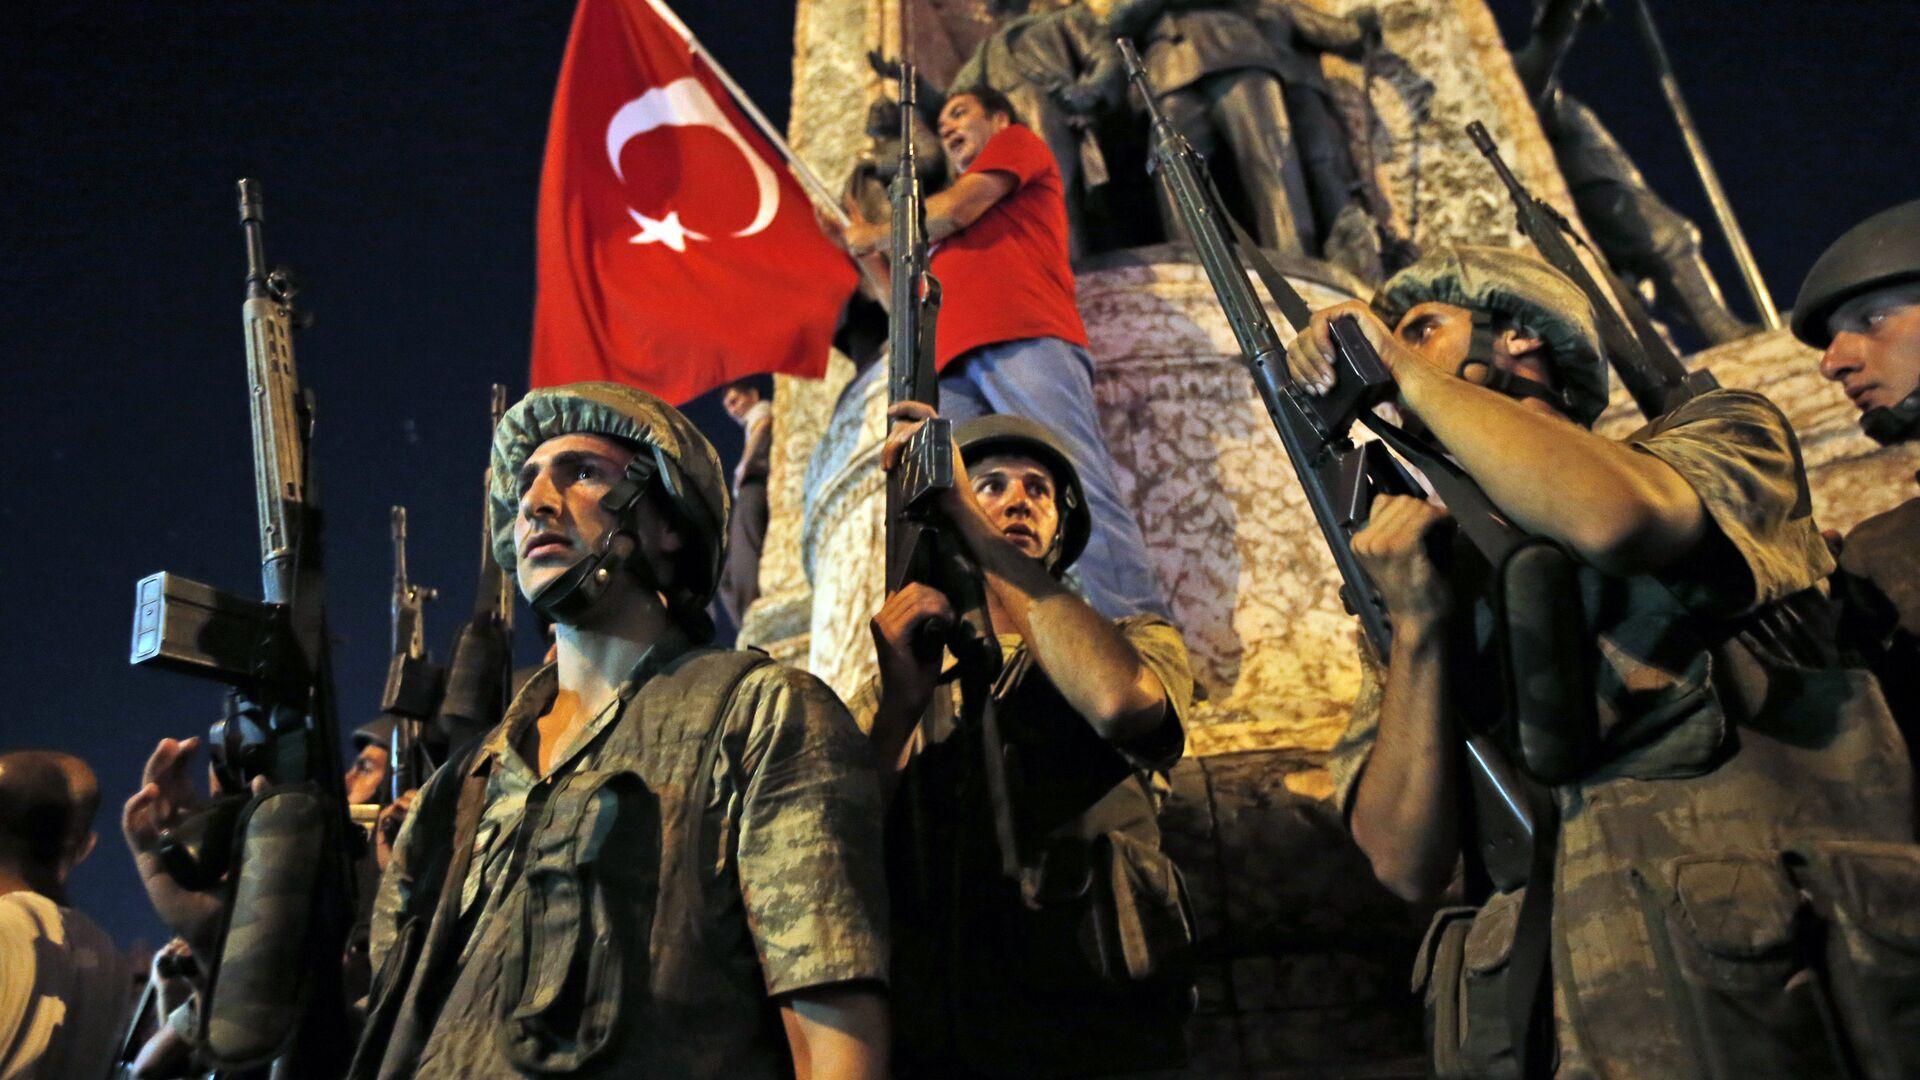 Golpe de estado en Turquía - Sputnik Mundo, 1920, 15.07.2021